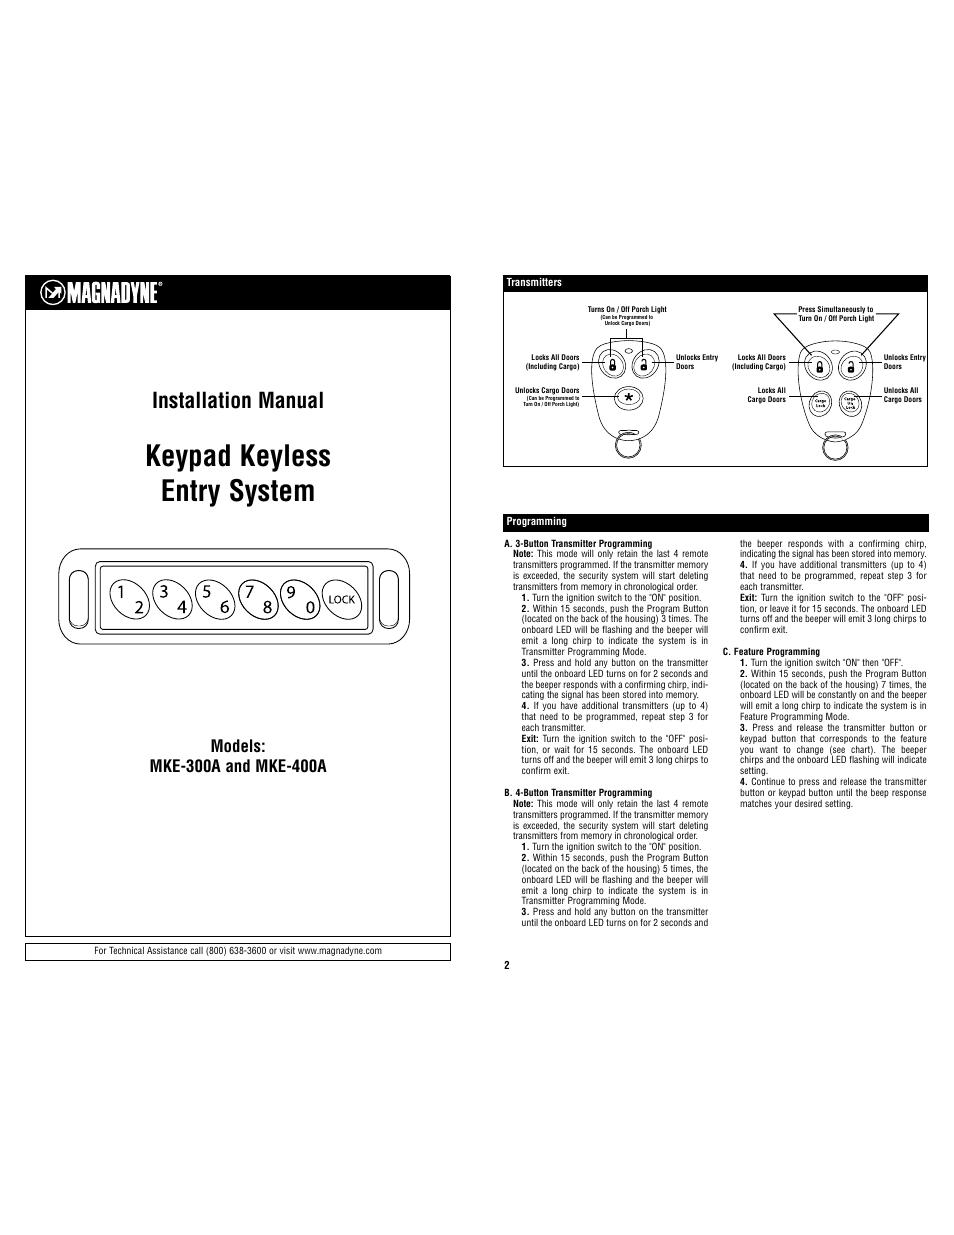 Magnadyne Keypad Keyless Entry System MKE-400A User Manual